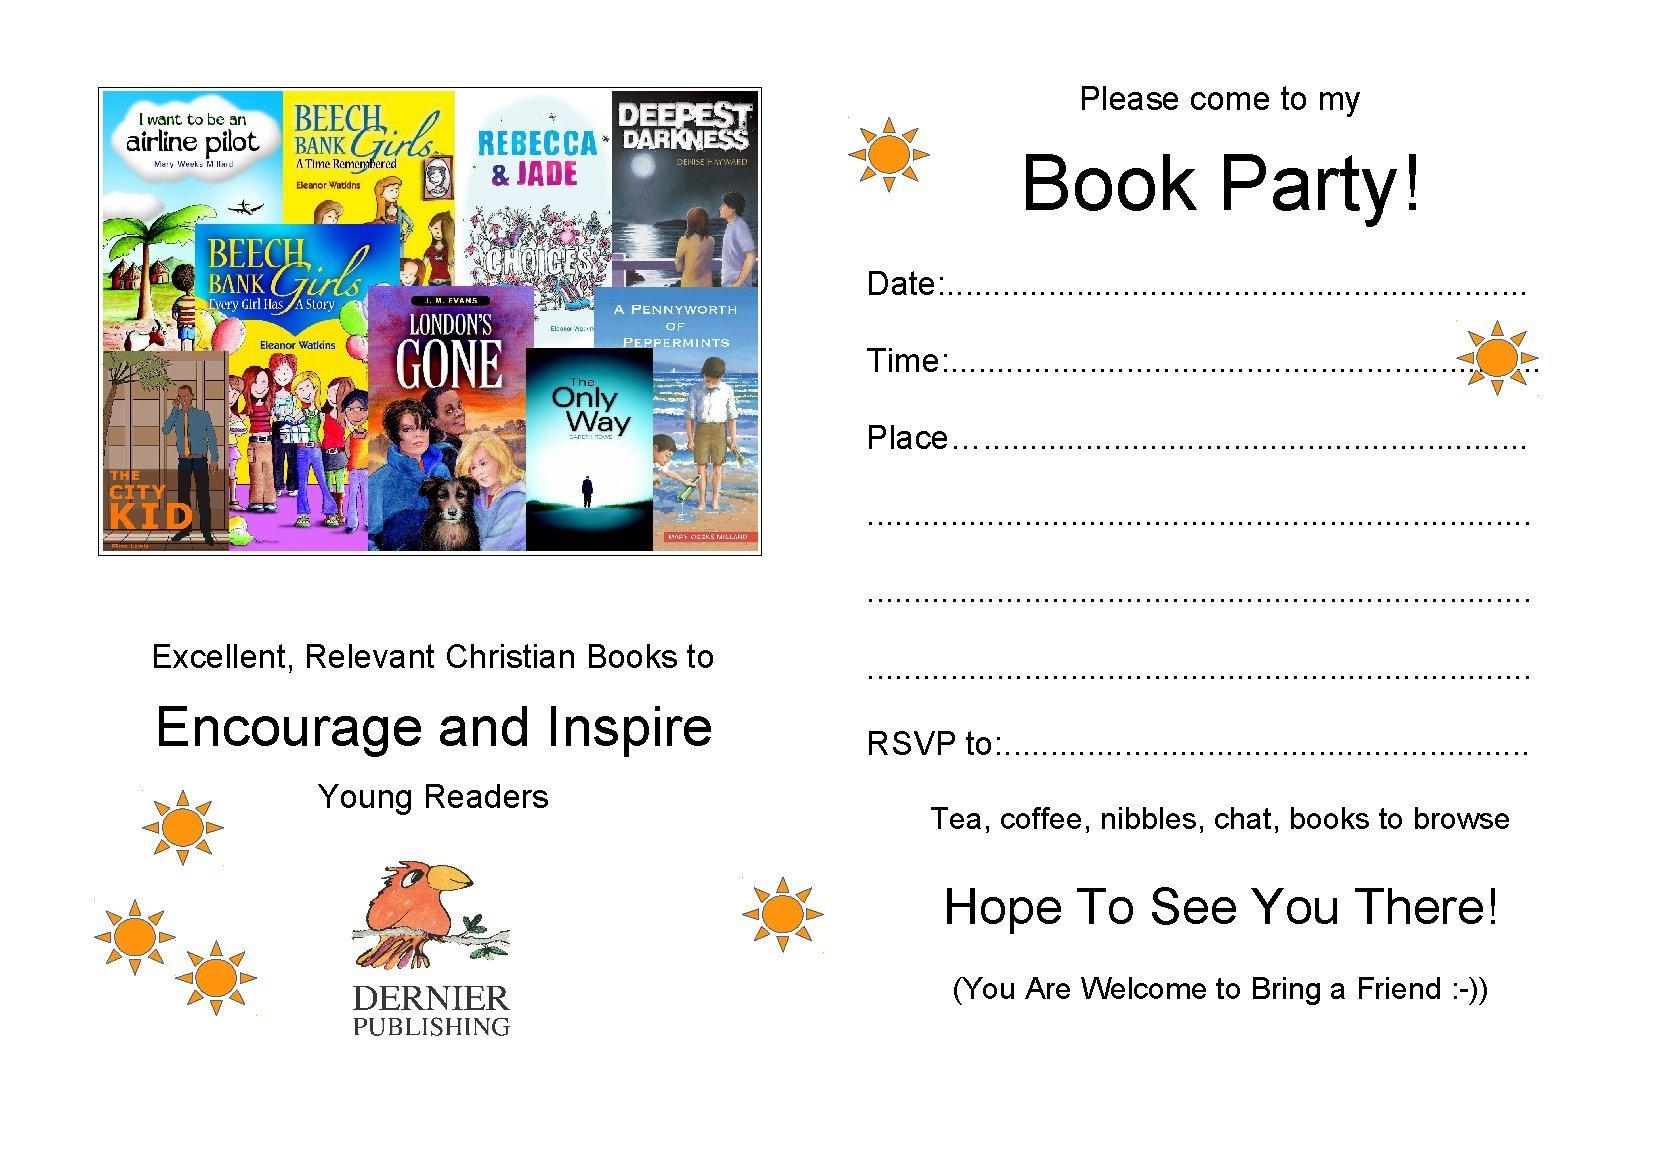 Dernier Publishing book party invite